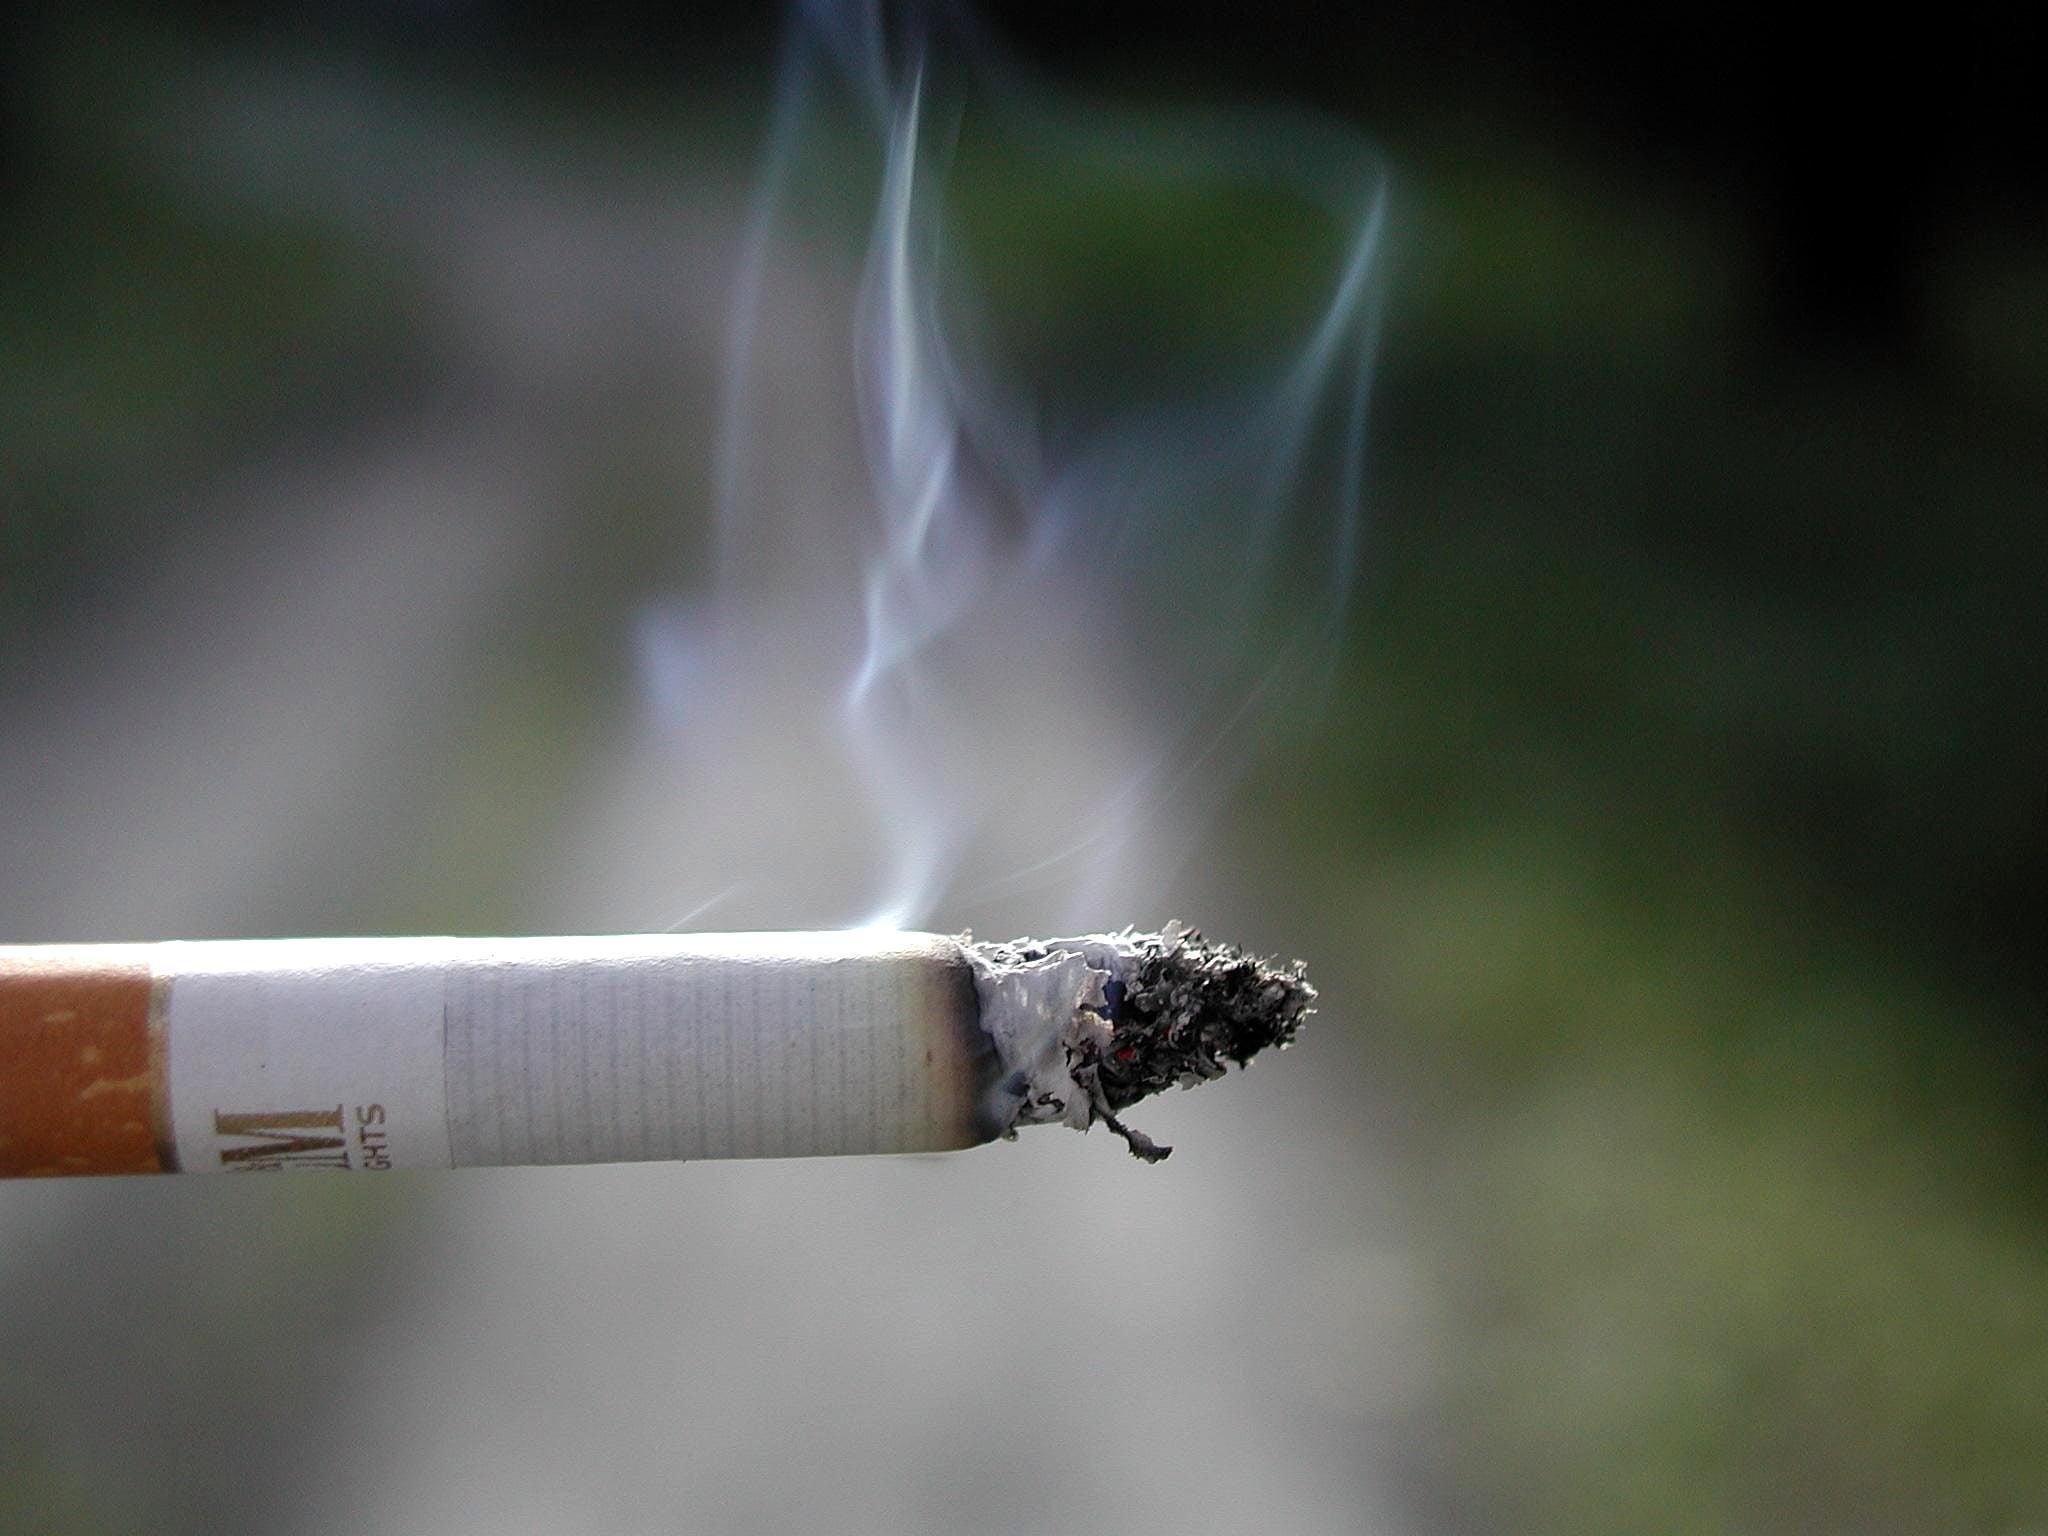 Do You Smoke? uBiome Wants To Study Your Mouthome